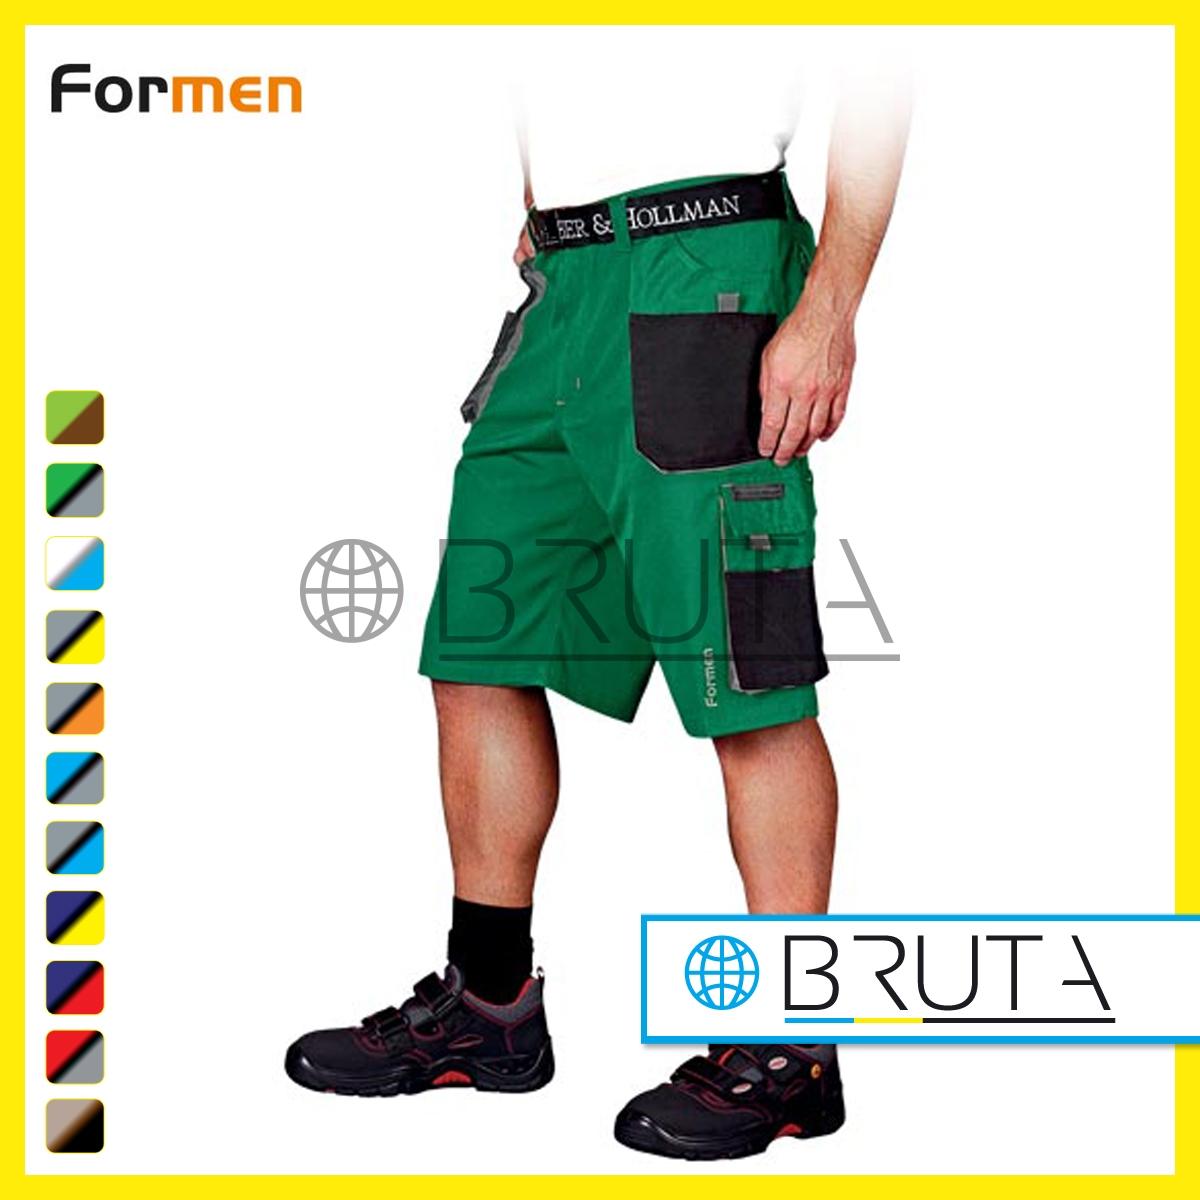 Spodnie robocze krótkie FORMEN Leber&Hollman